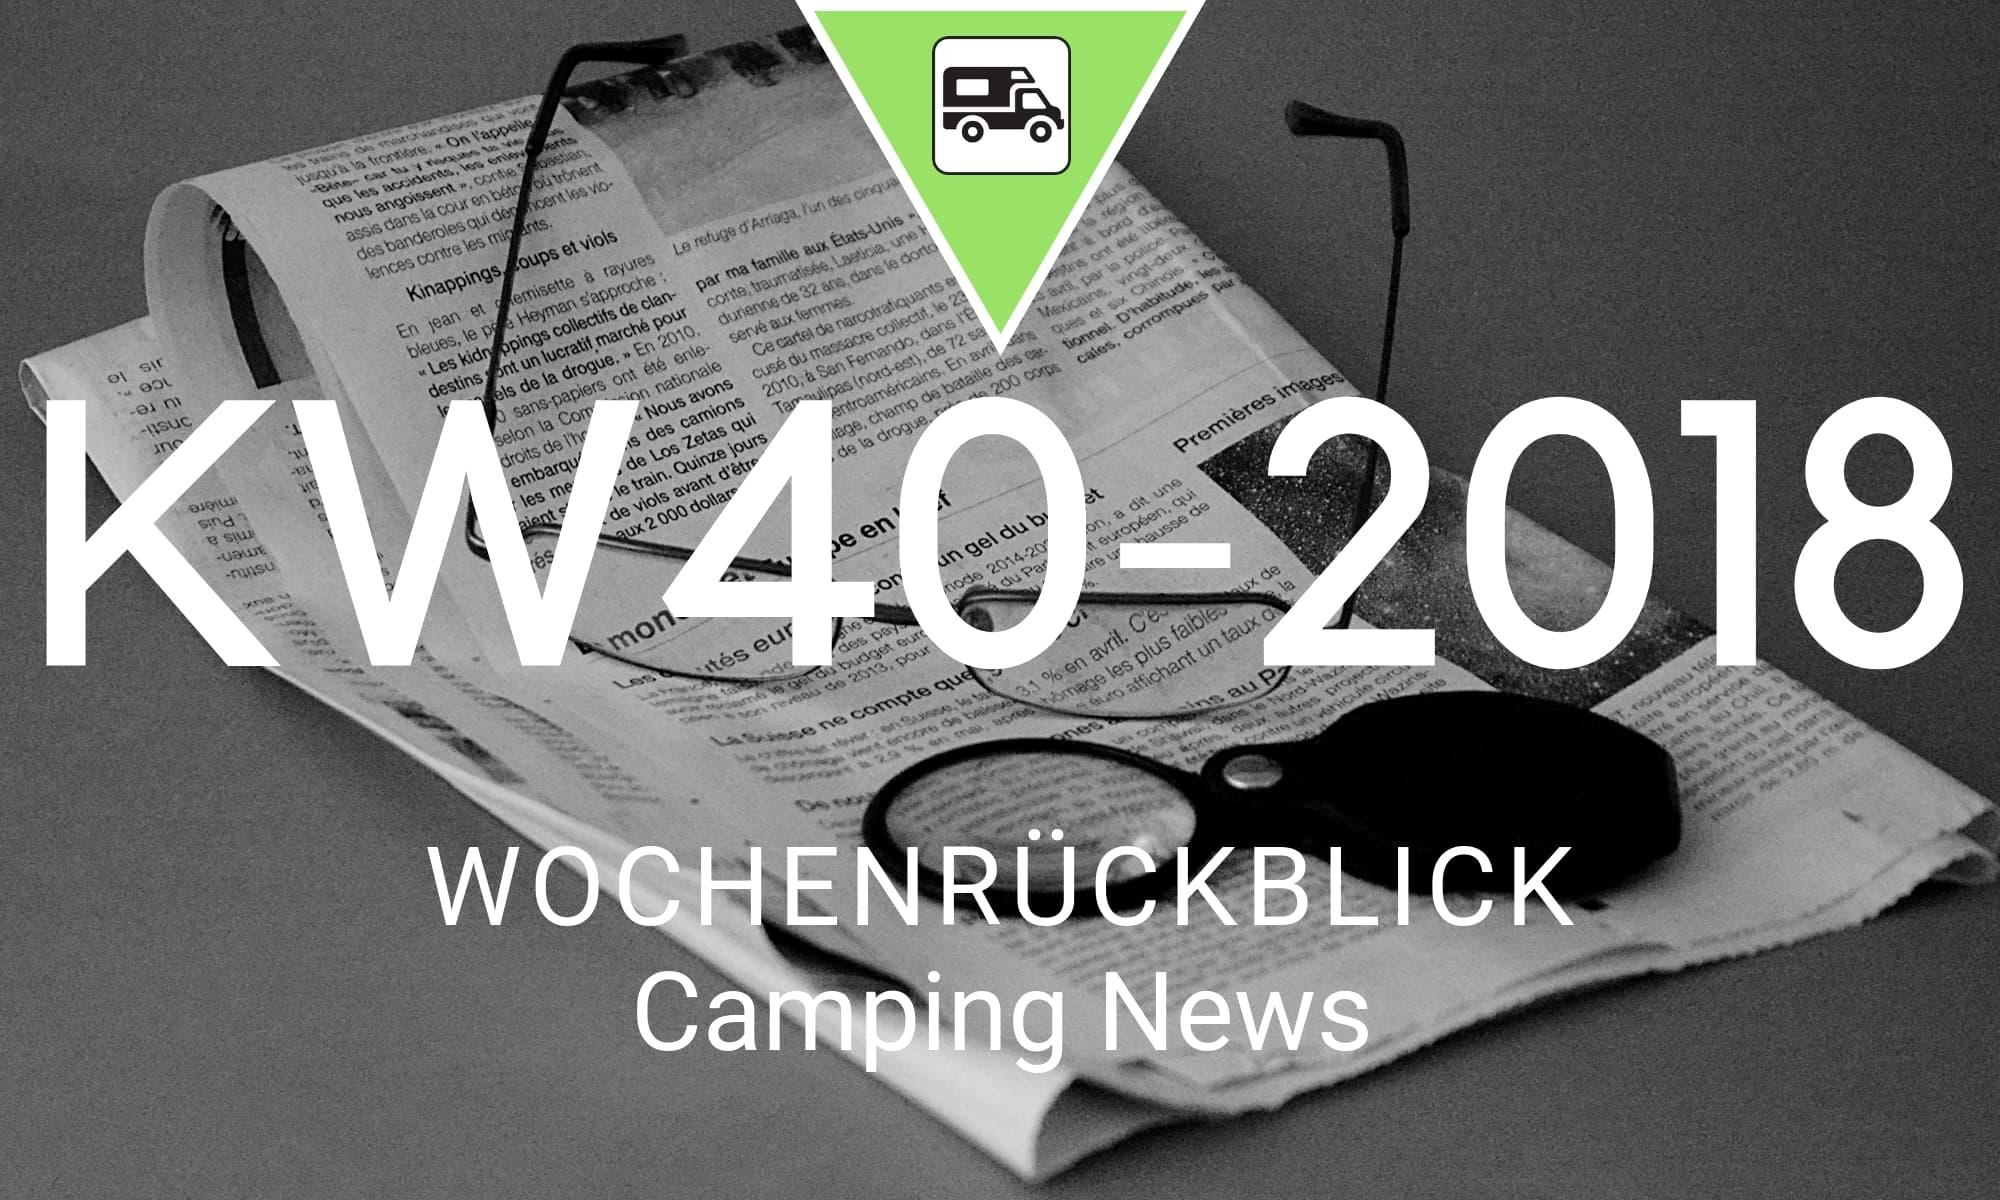 Wochenrückblick Camping News KW40-2018